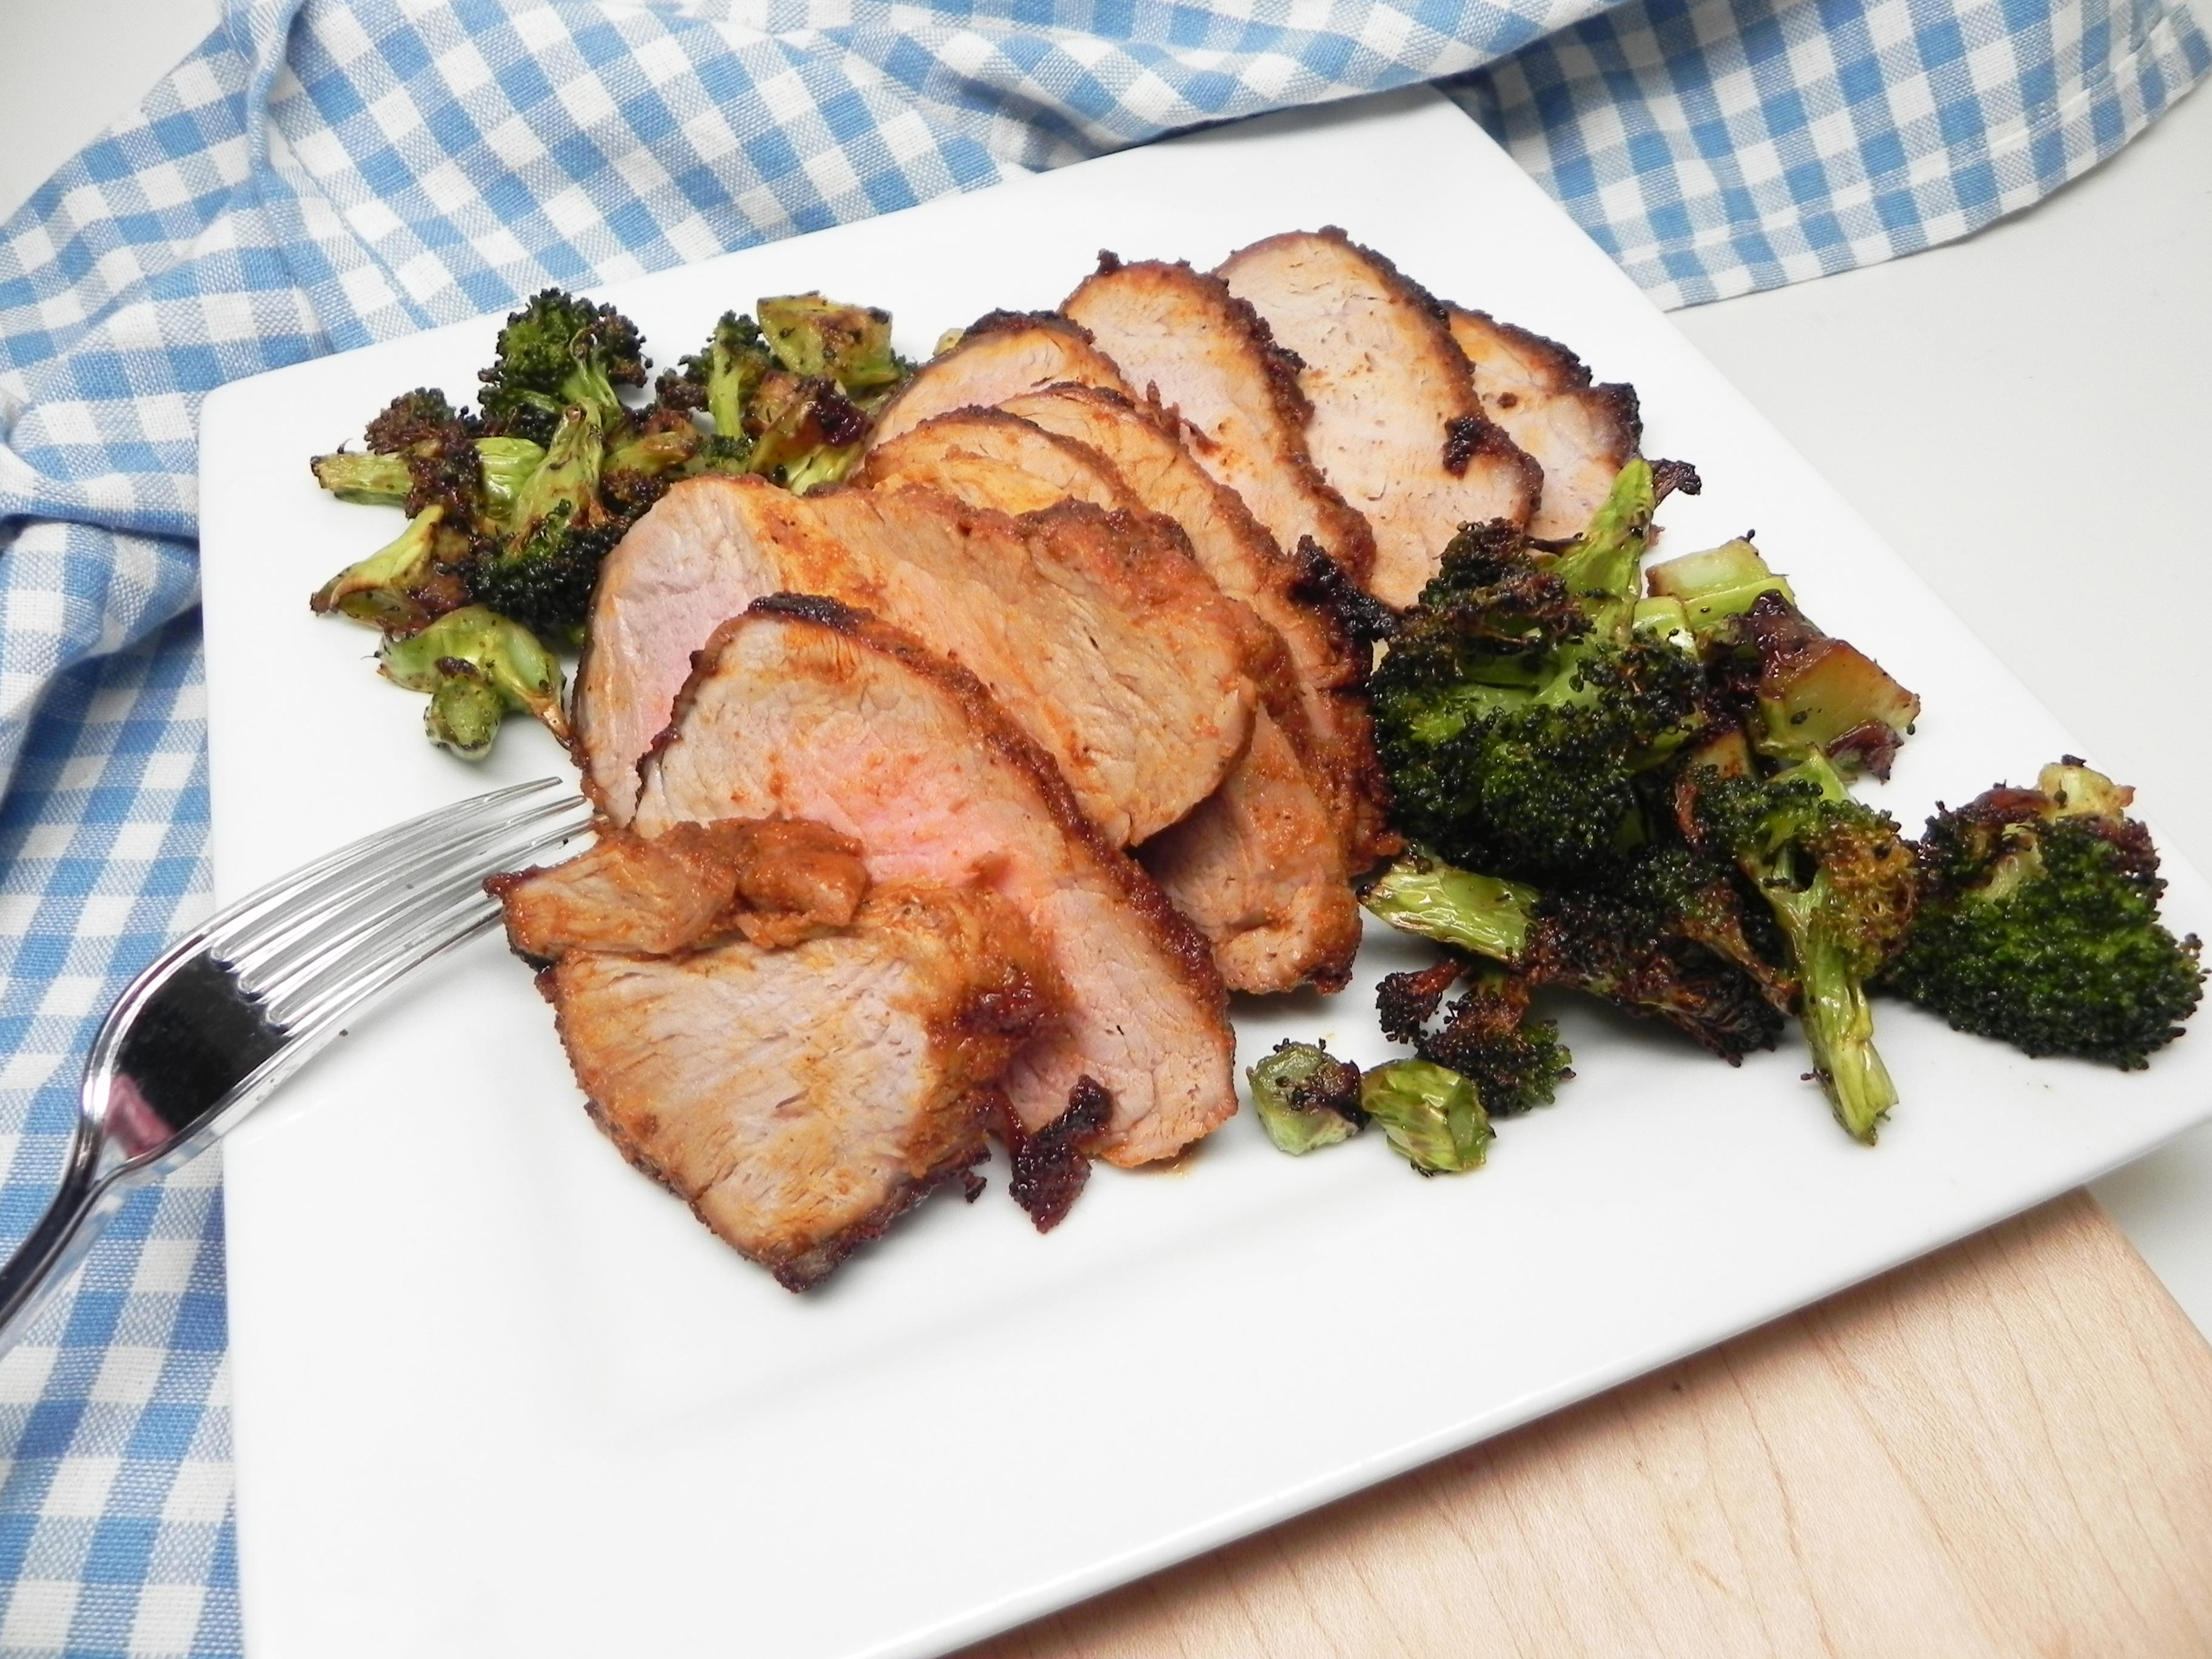 Air Fryer Dry-Rubbed Pork Tenderloin with Broccoli Soup Loving Nicole